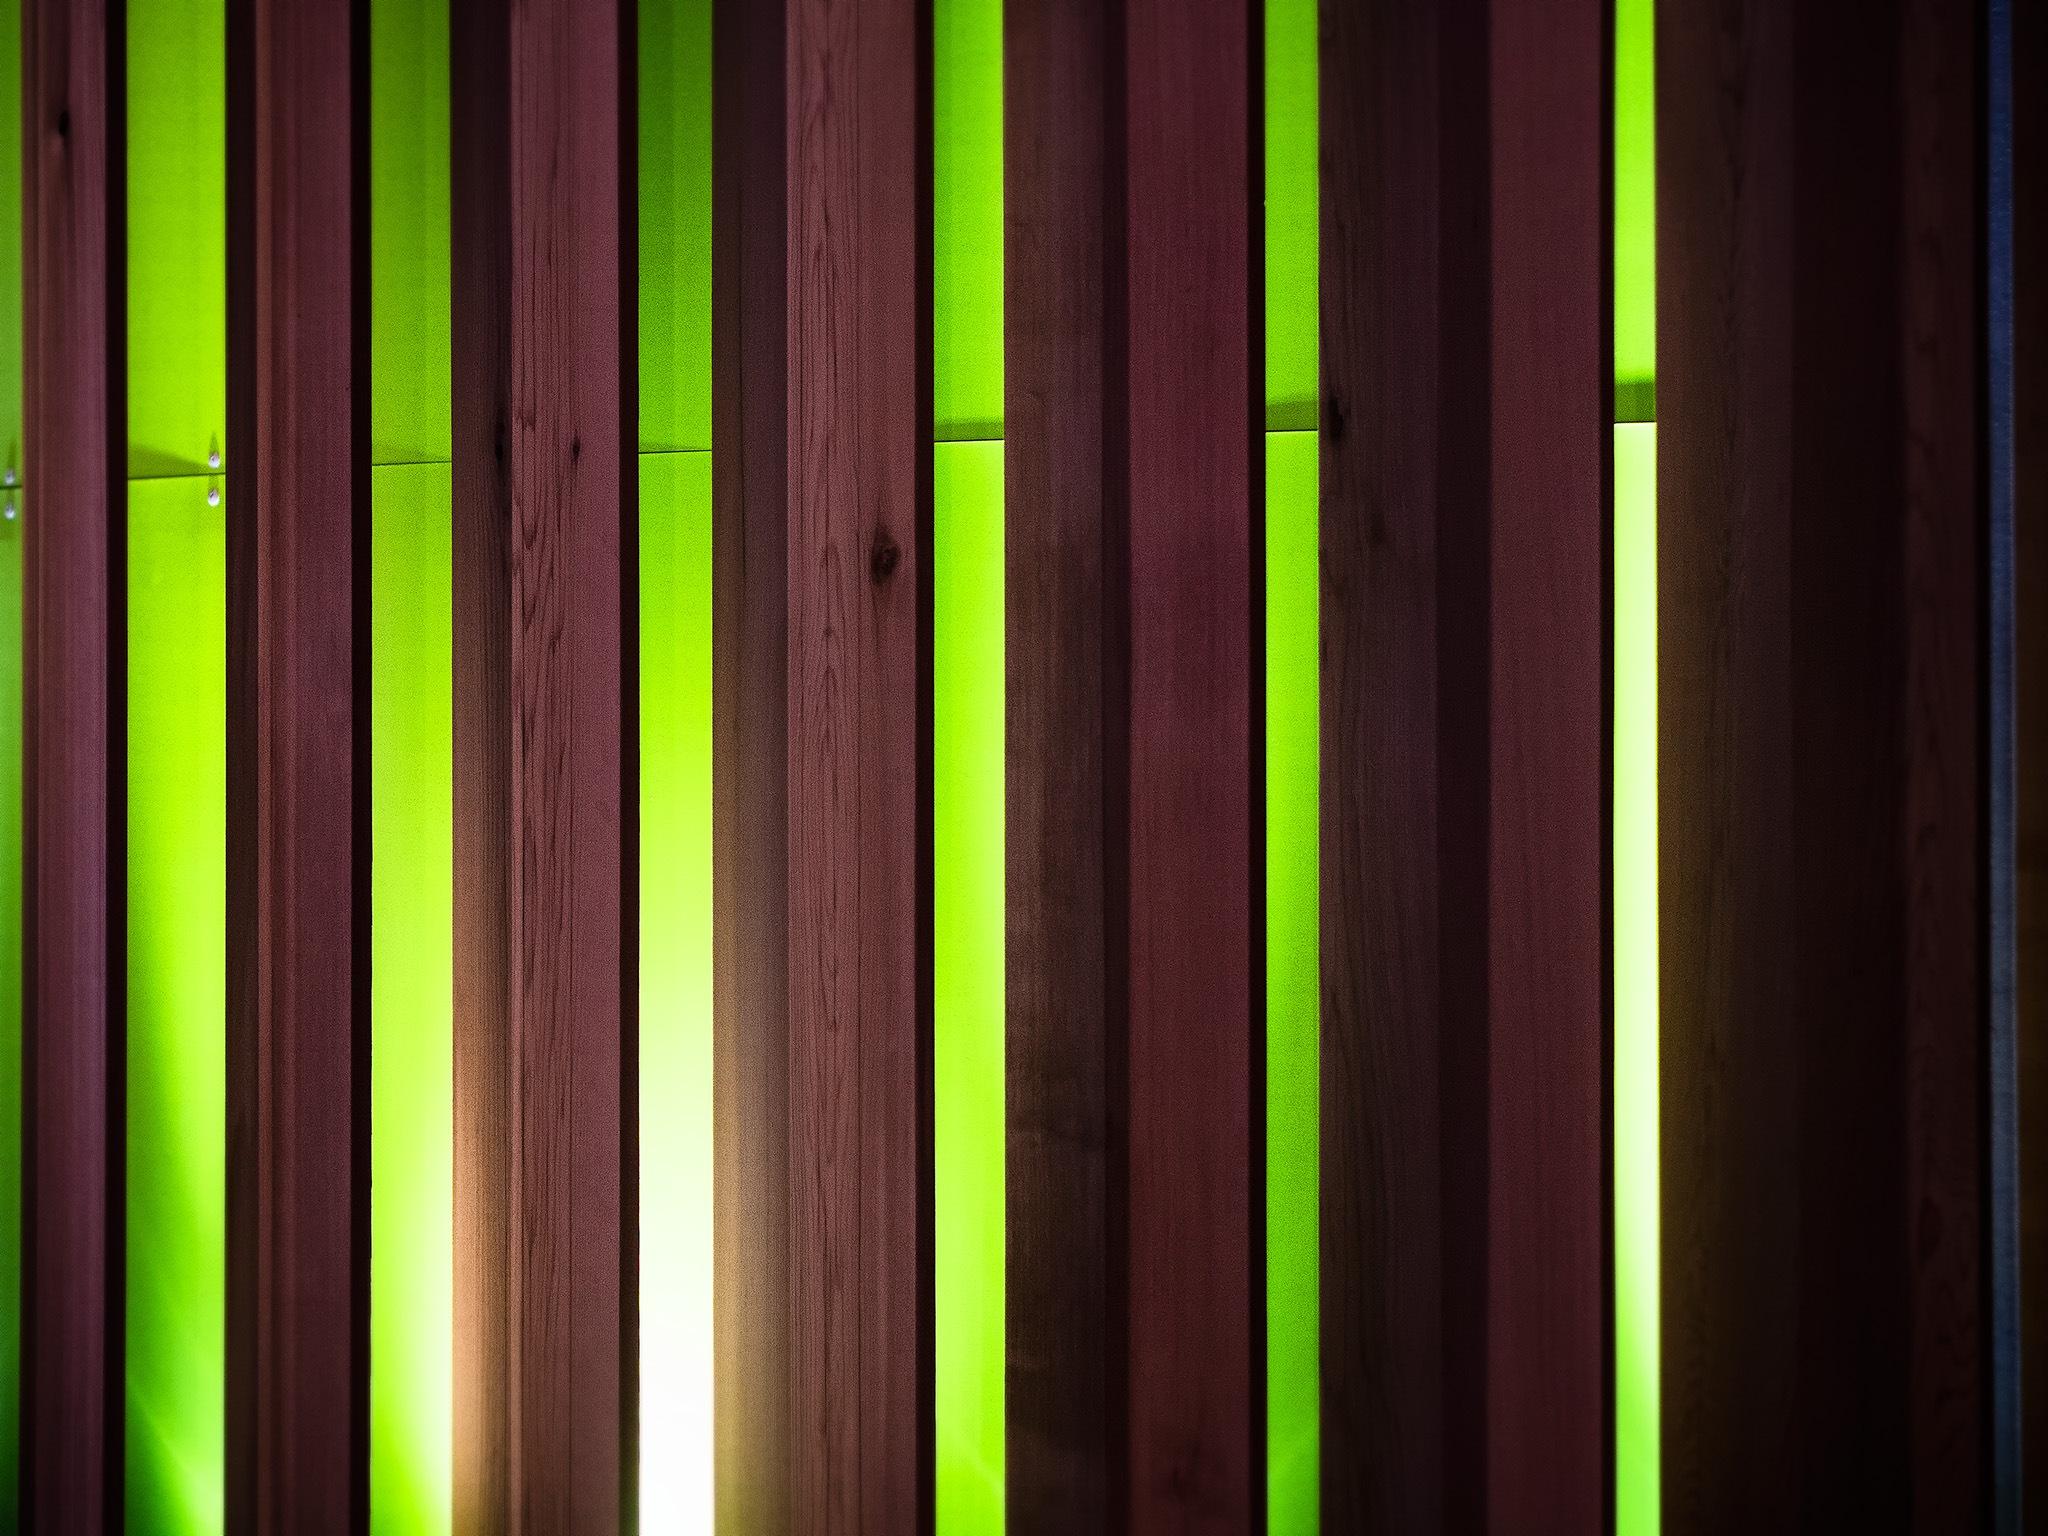 Stripes II by DavidNorfolk